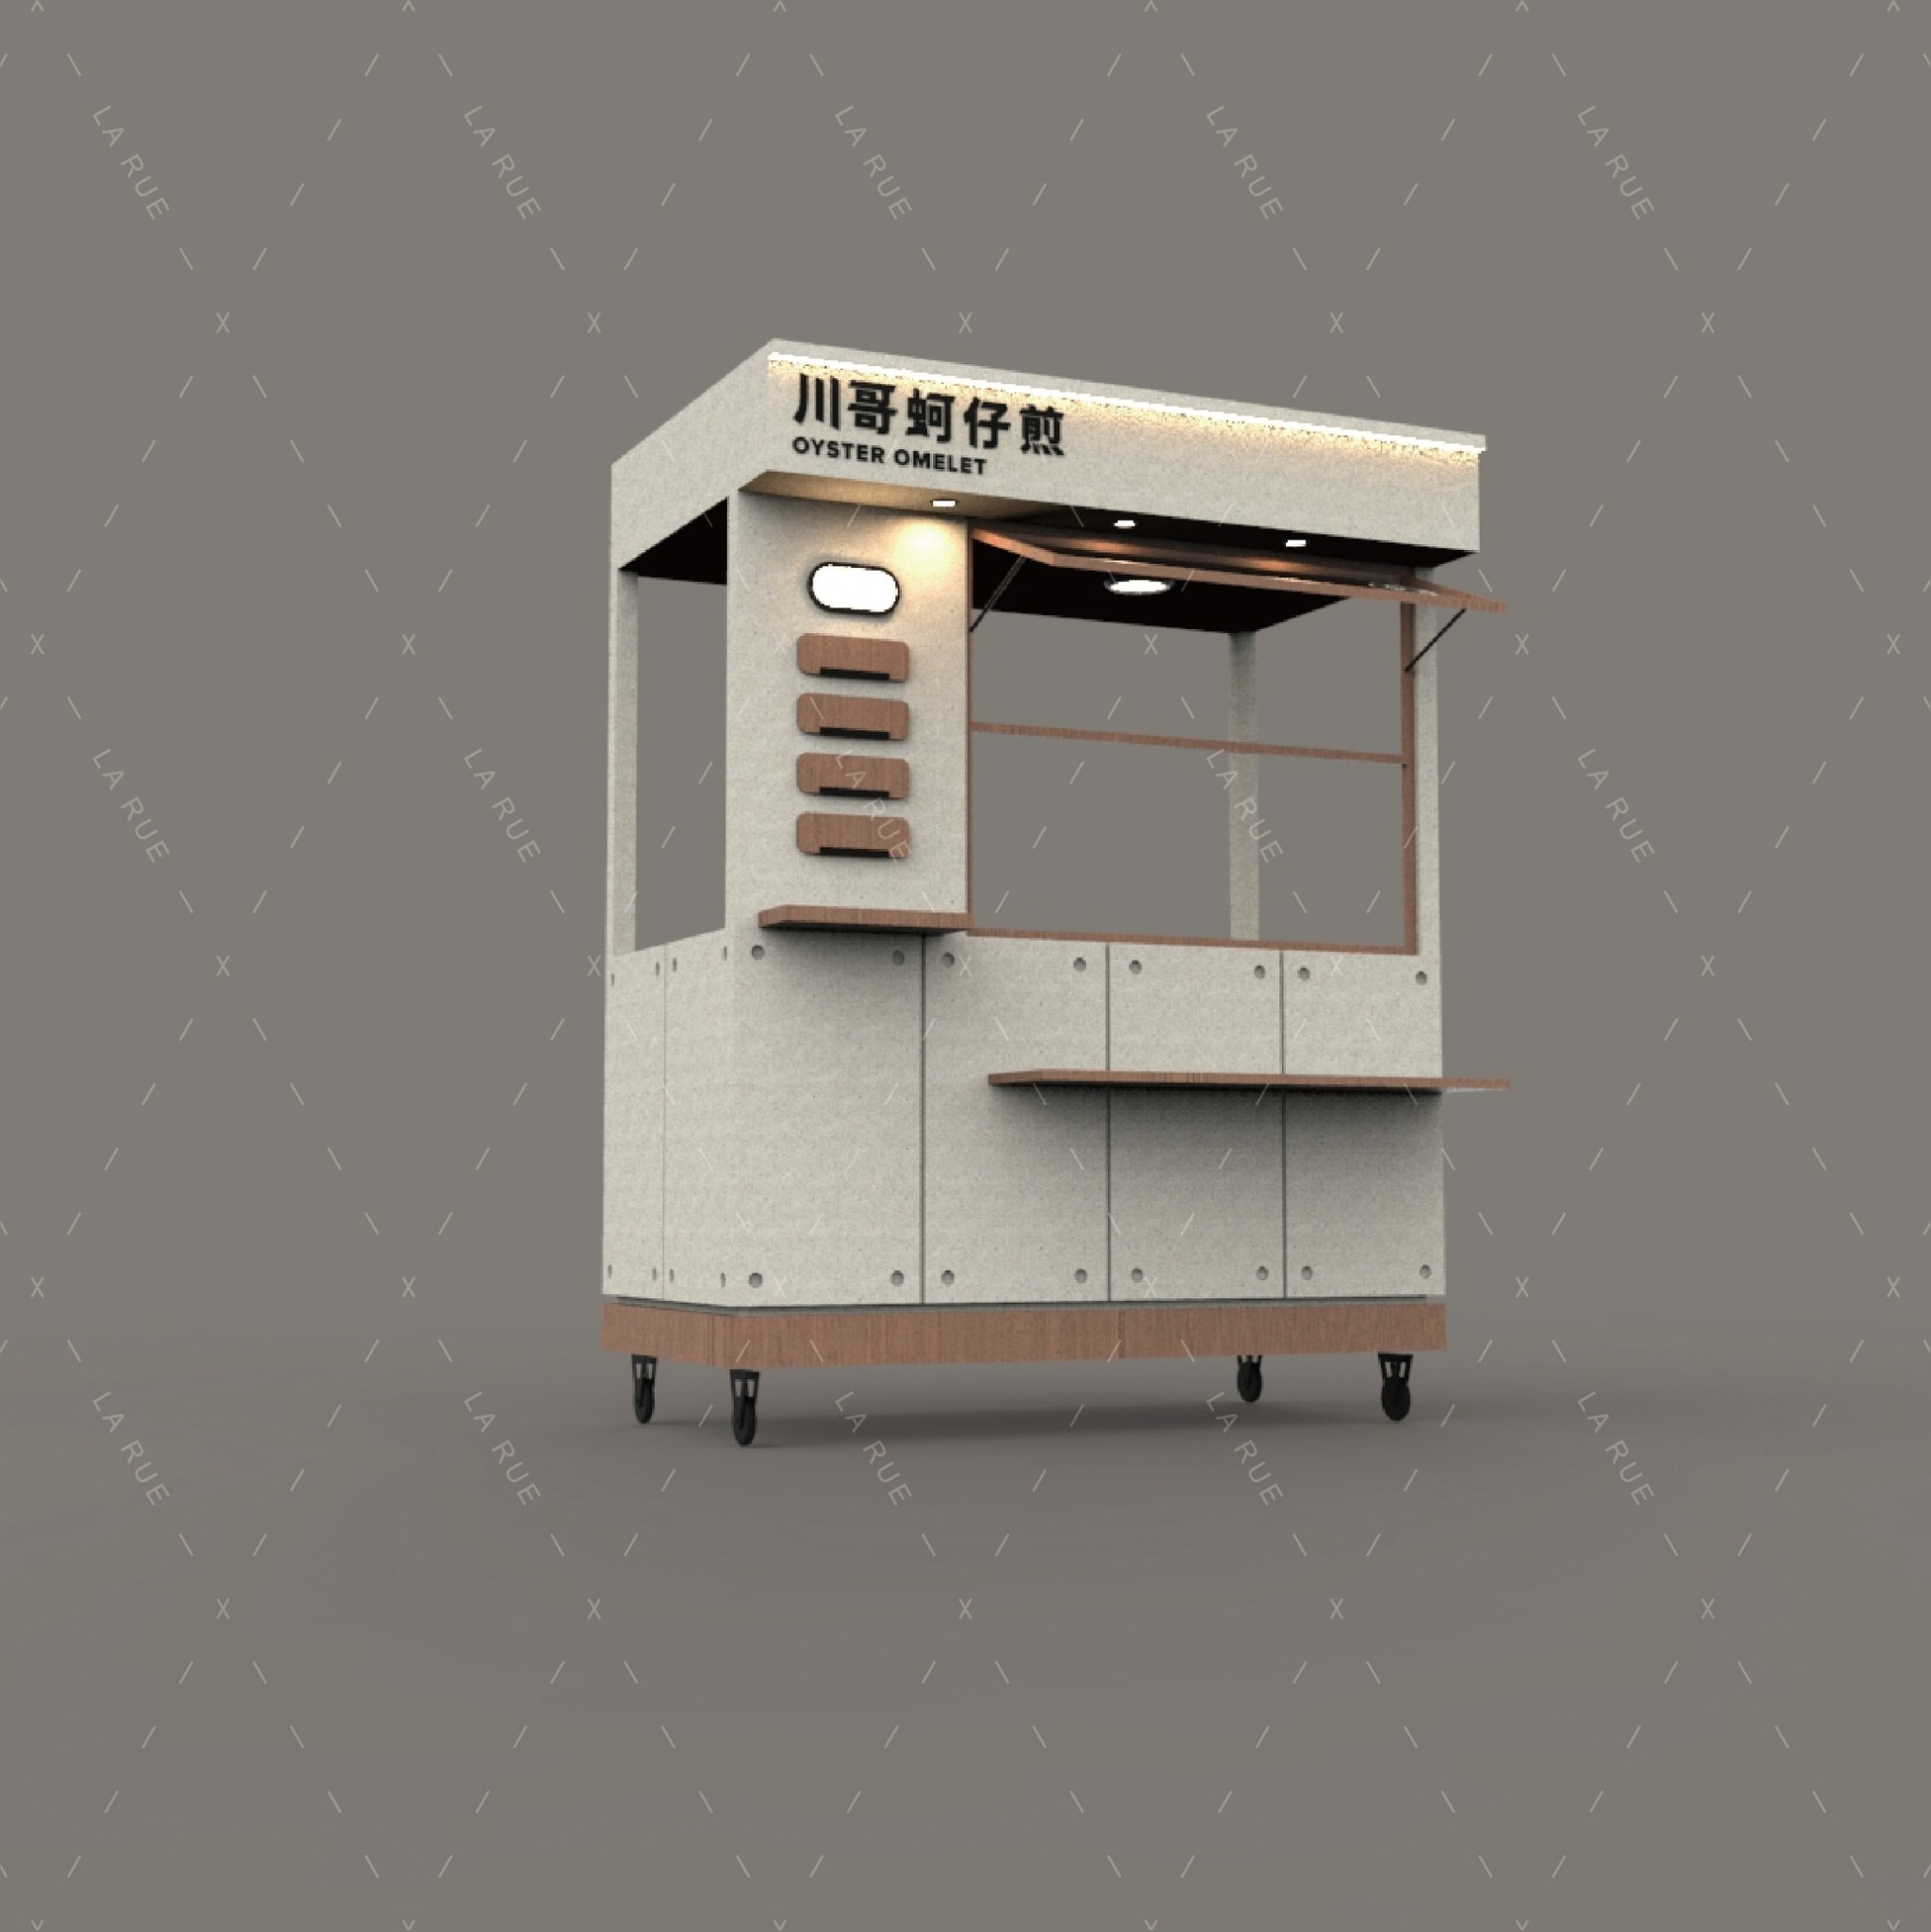 浮水印餐車_210615_65